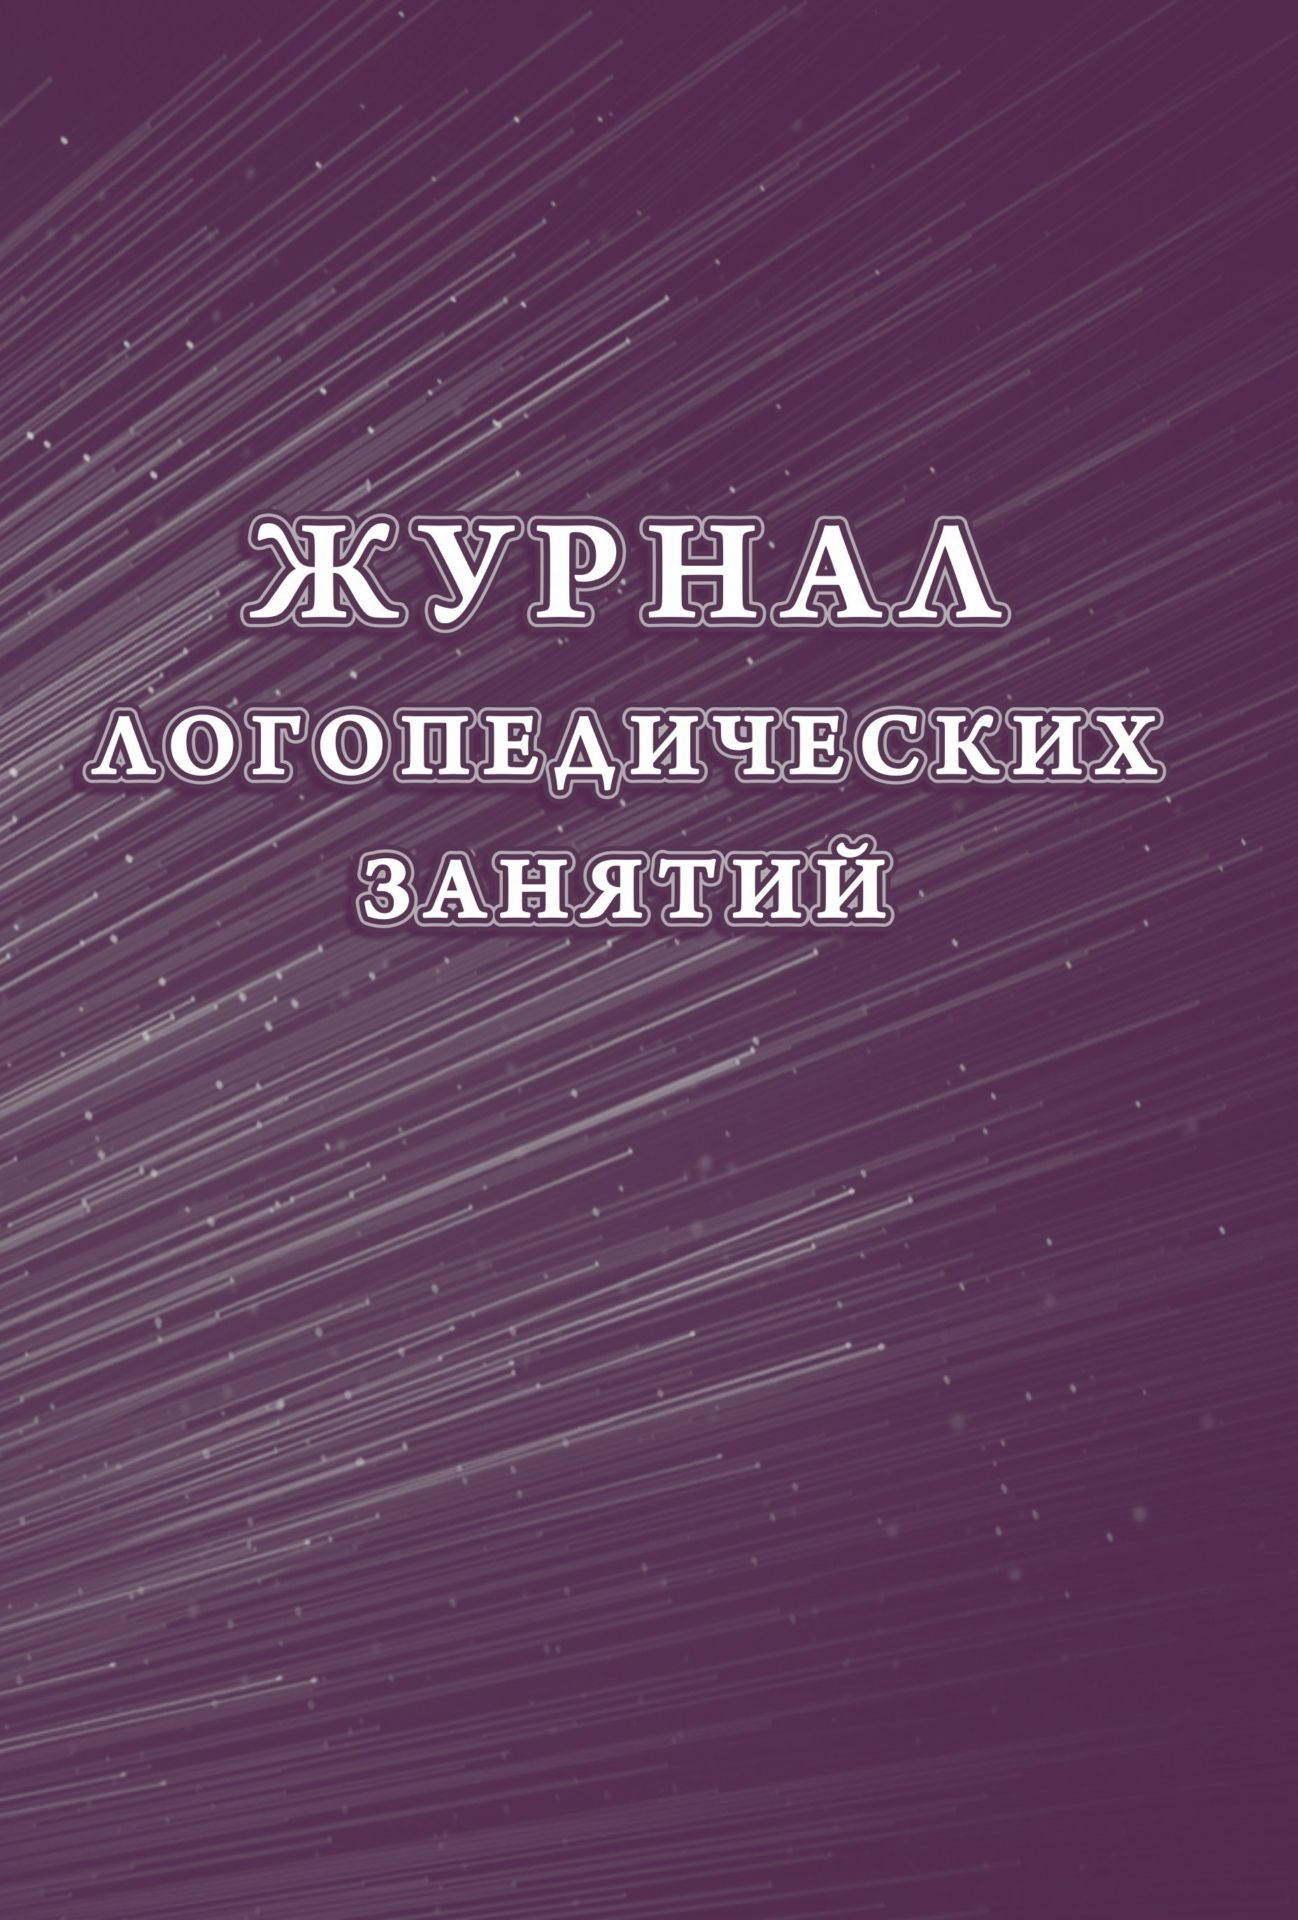 Журнал логопедических занятий./КЖ-114/1